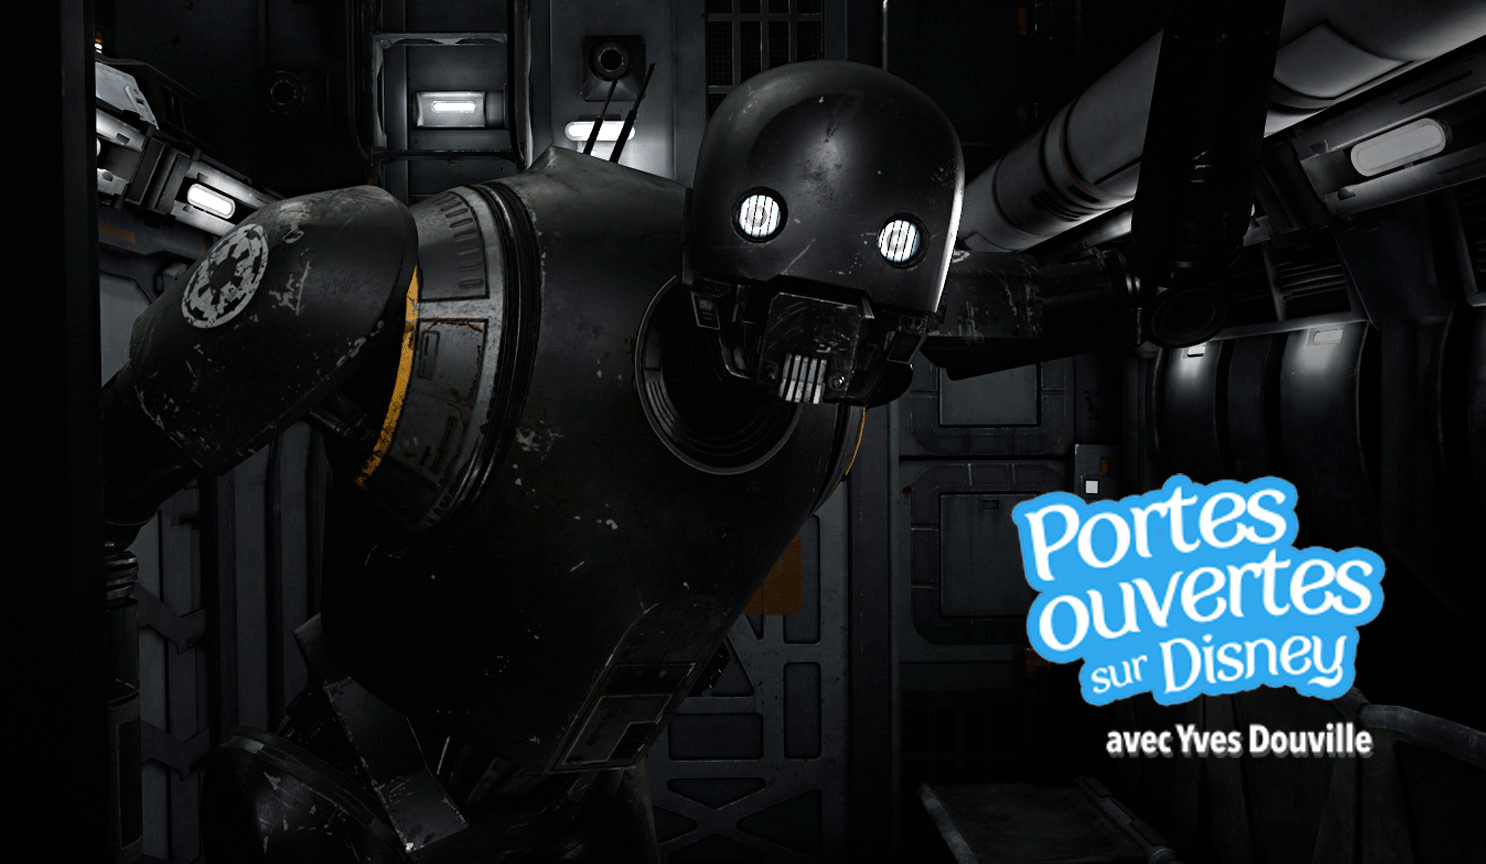 Une expérience Star Wars à Walt Disney World et Disneyland